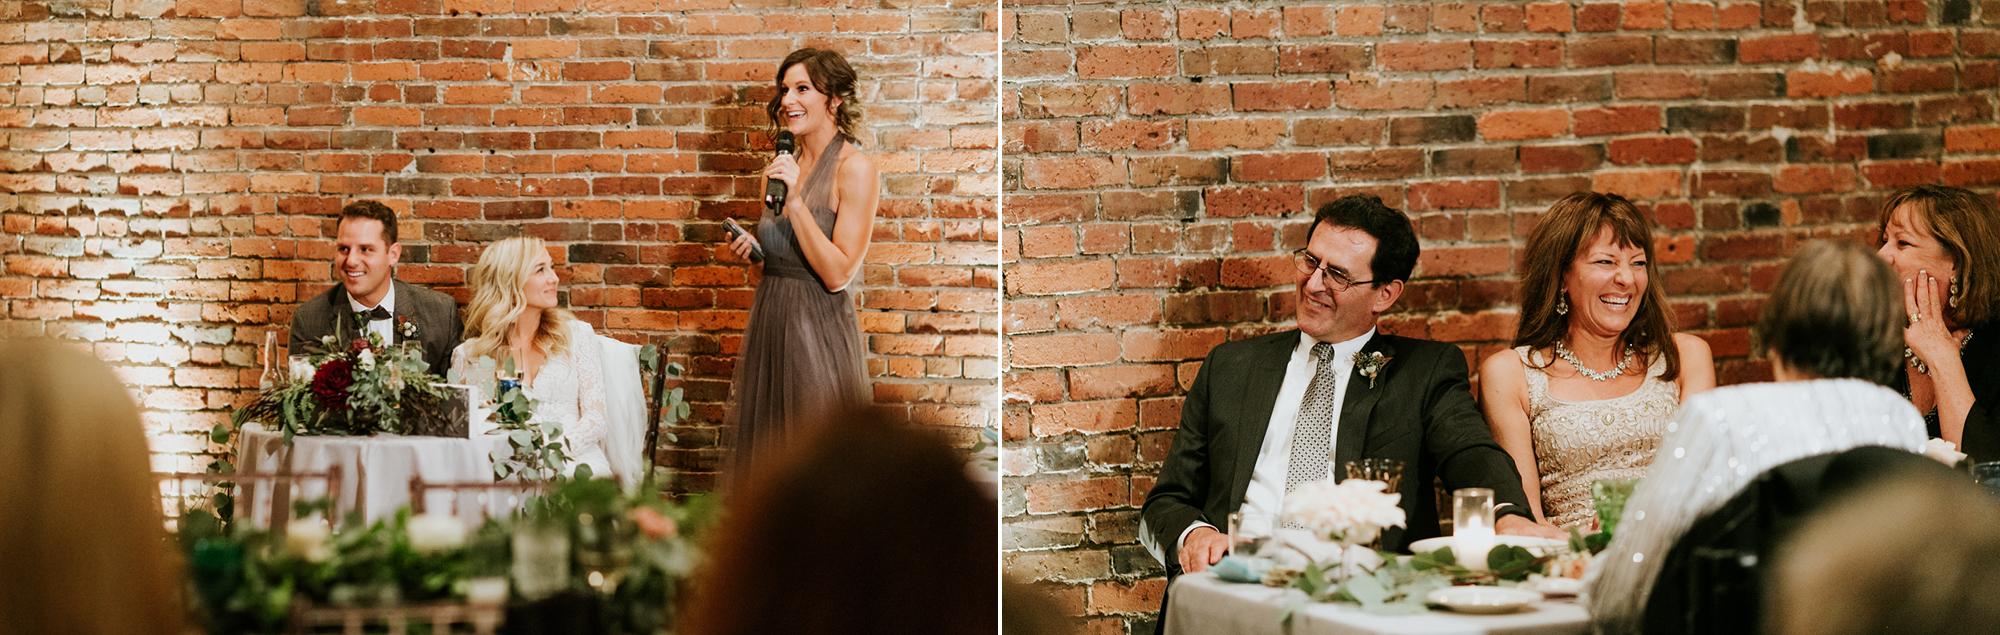 wedding-toasts-seattle2